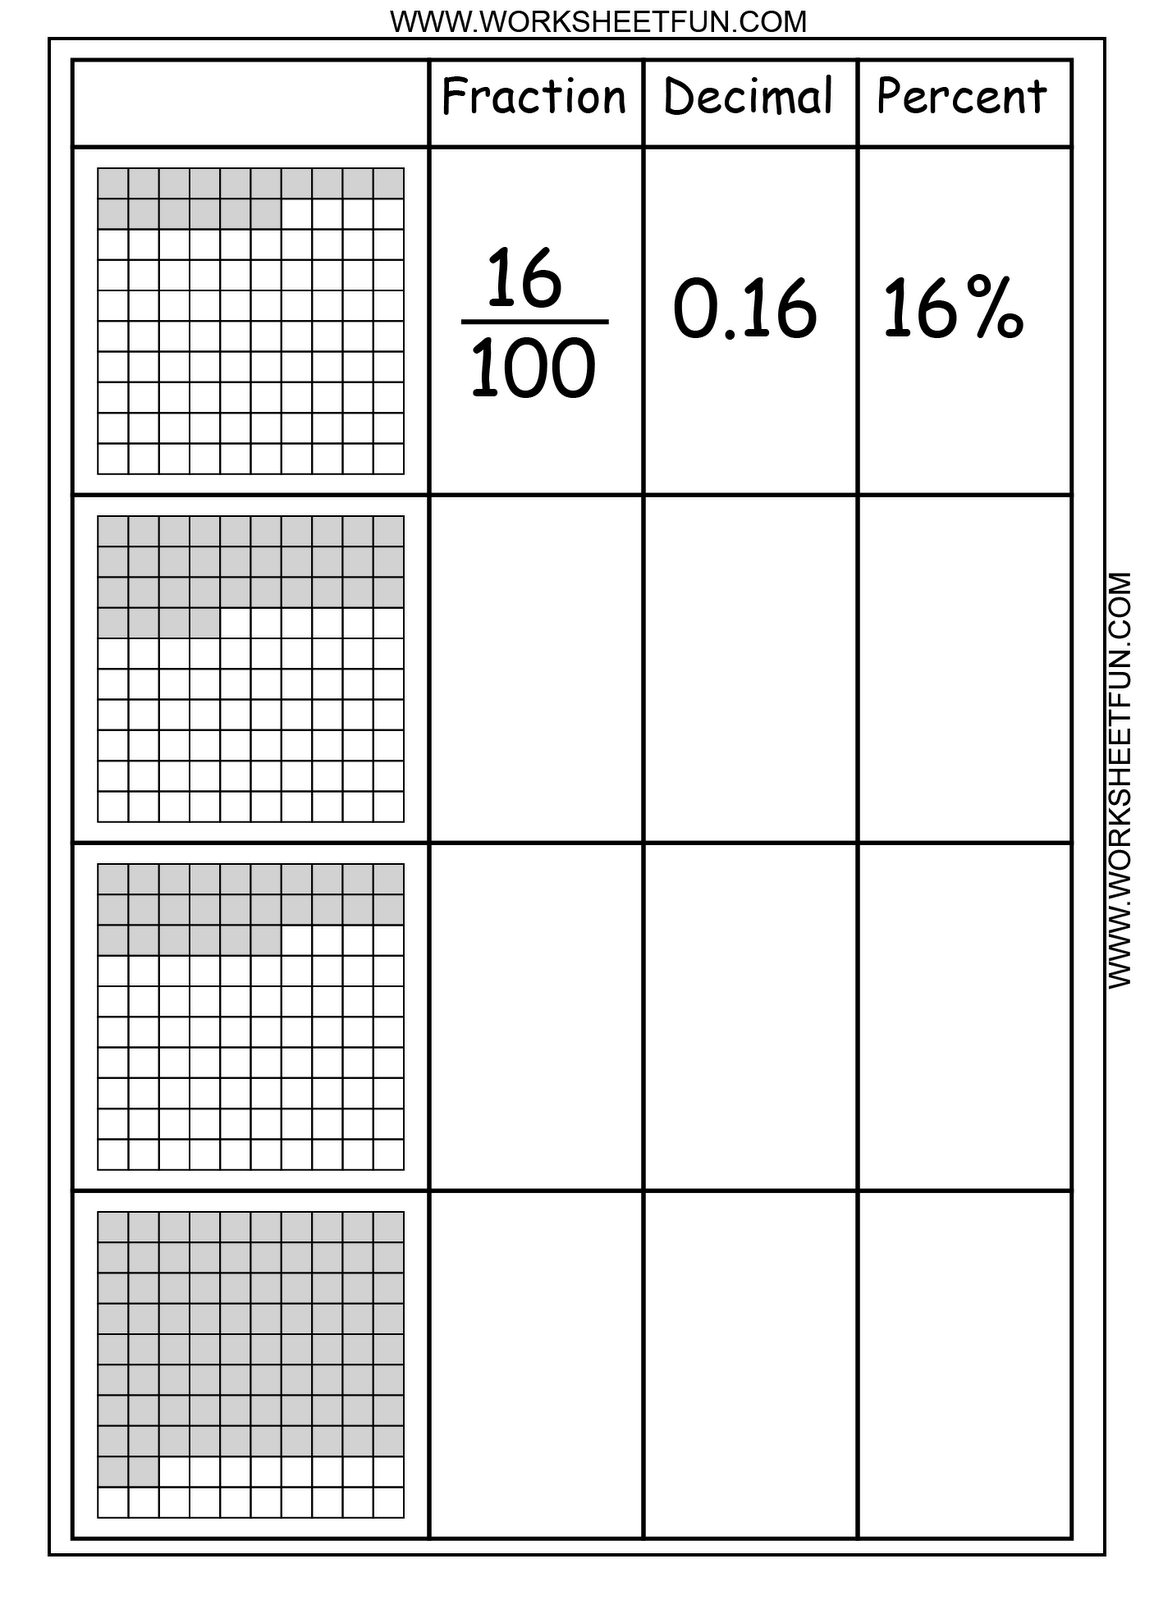 hight resolution of Worksheetfun - FREE PRINTABLE WORKSHEETS   Math fractions